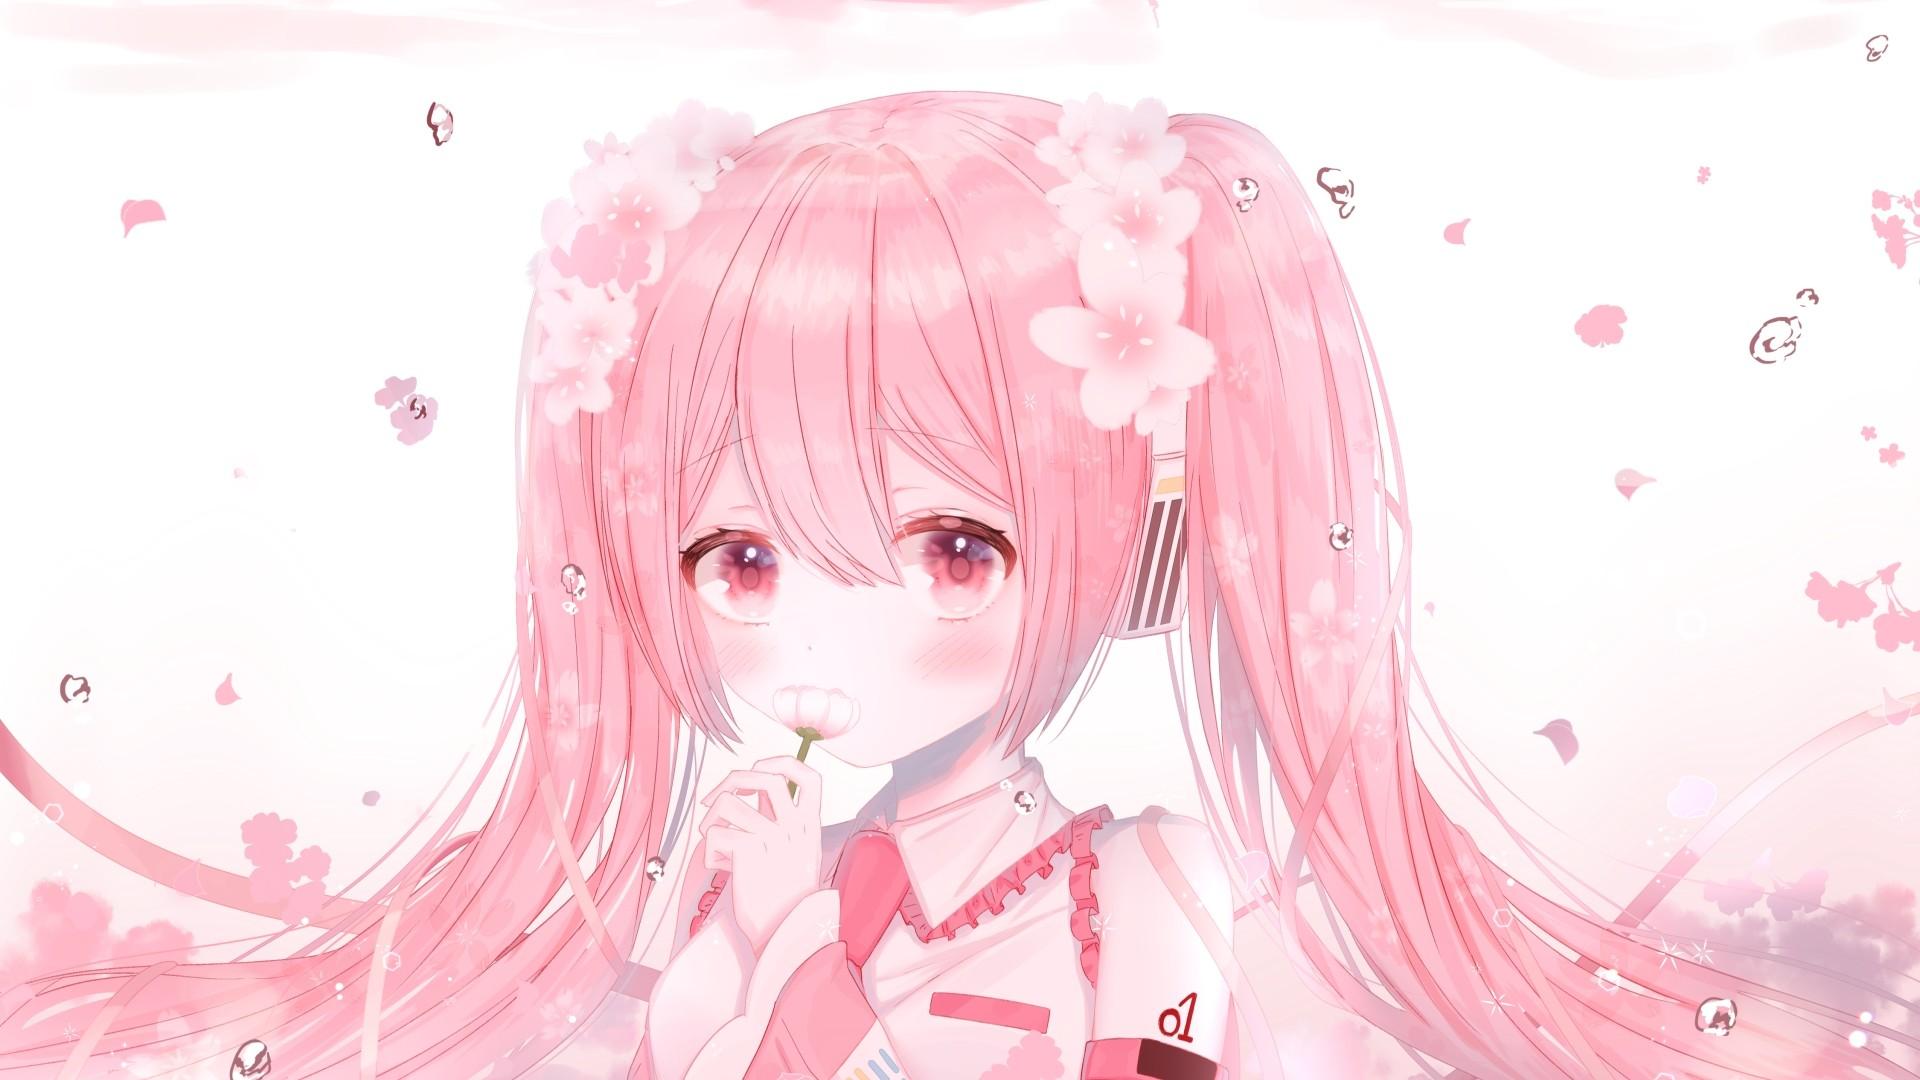 Pink Hair Anime Girl a wallpaper